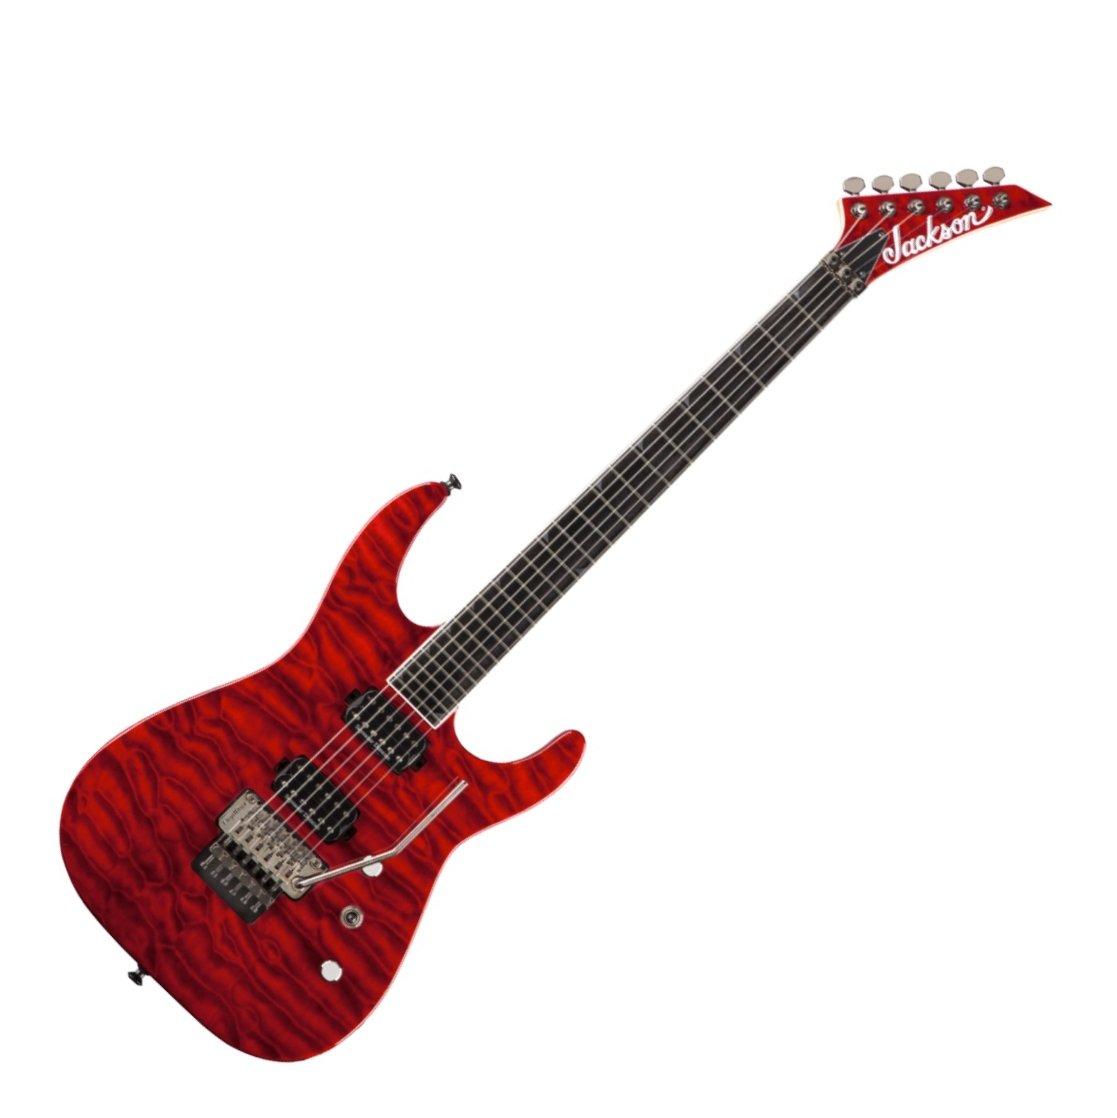 jackson sl2q pro soloist electric guitar in transparent red. Black Bedroom Furniture Sets. Home Design Ideas